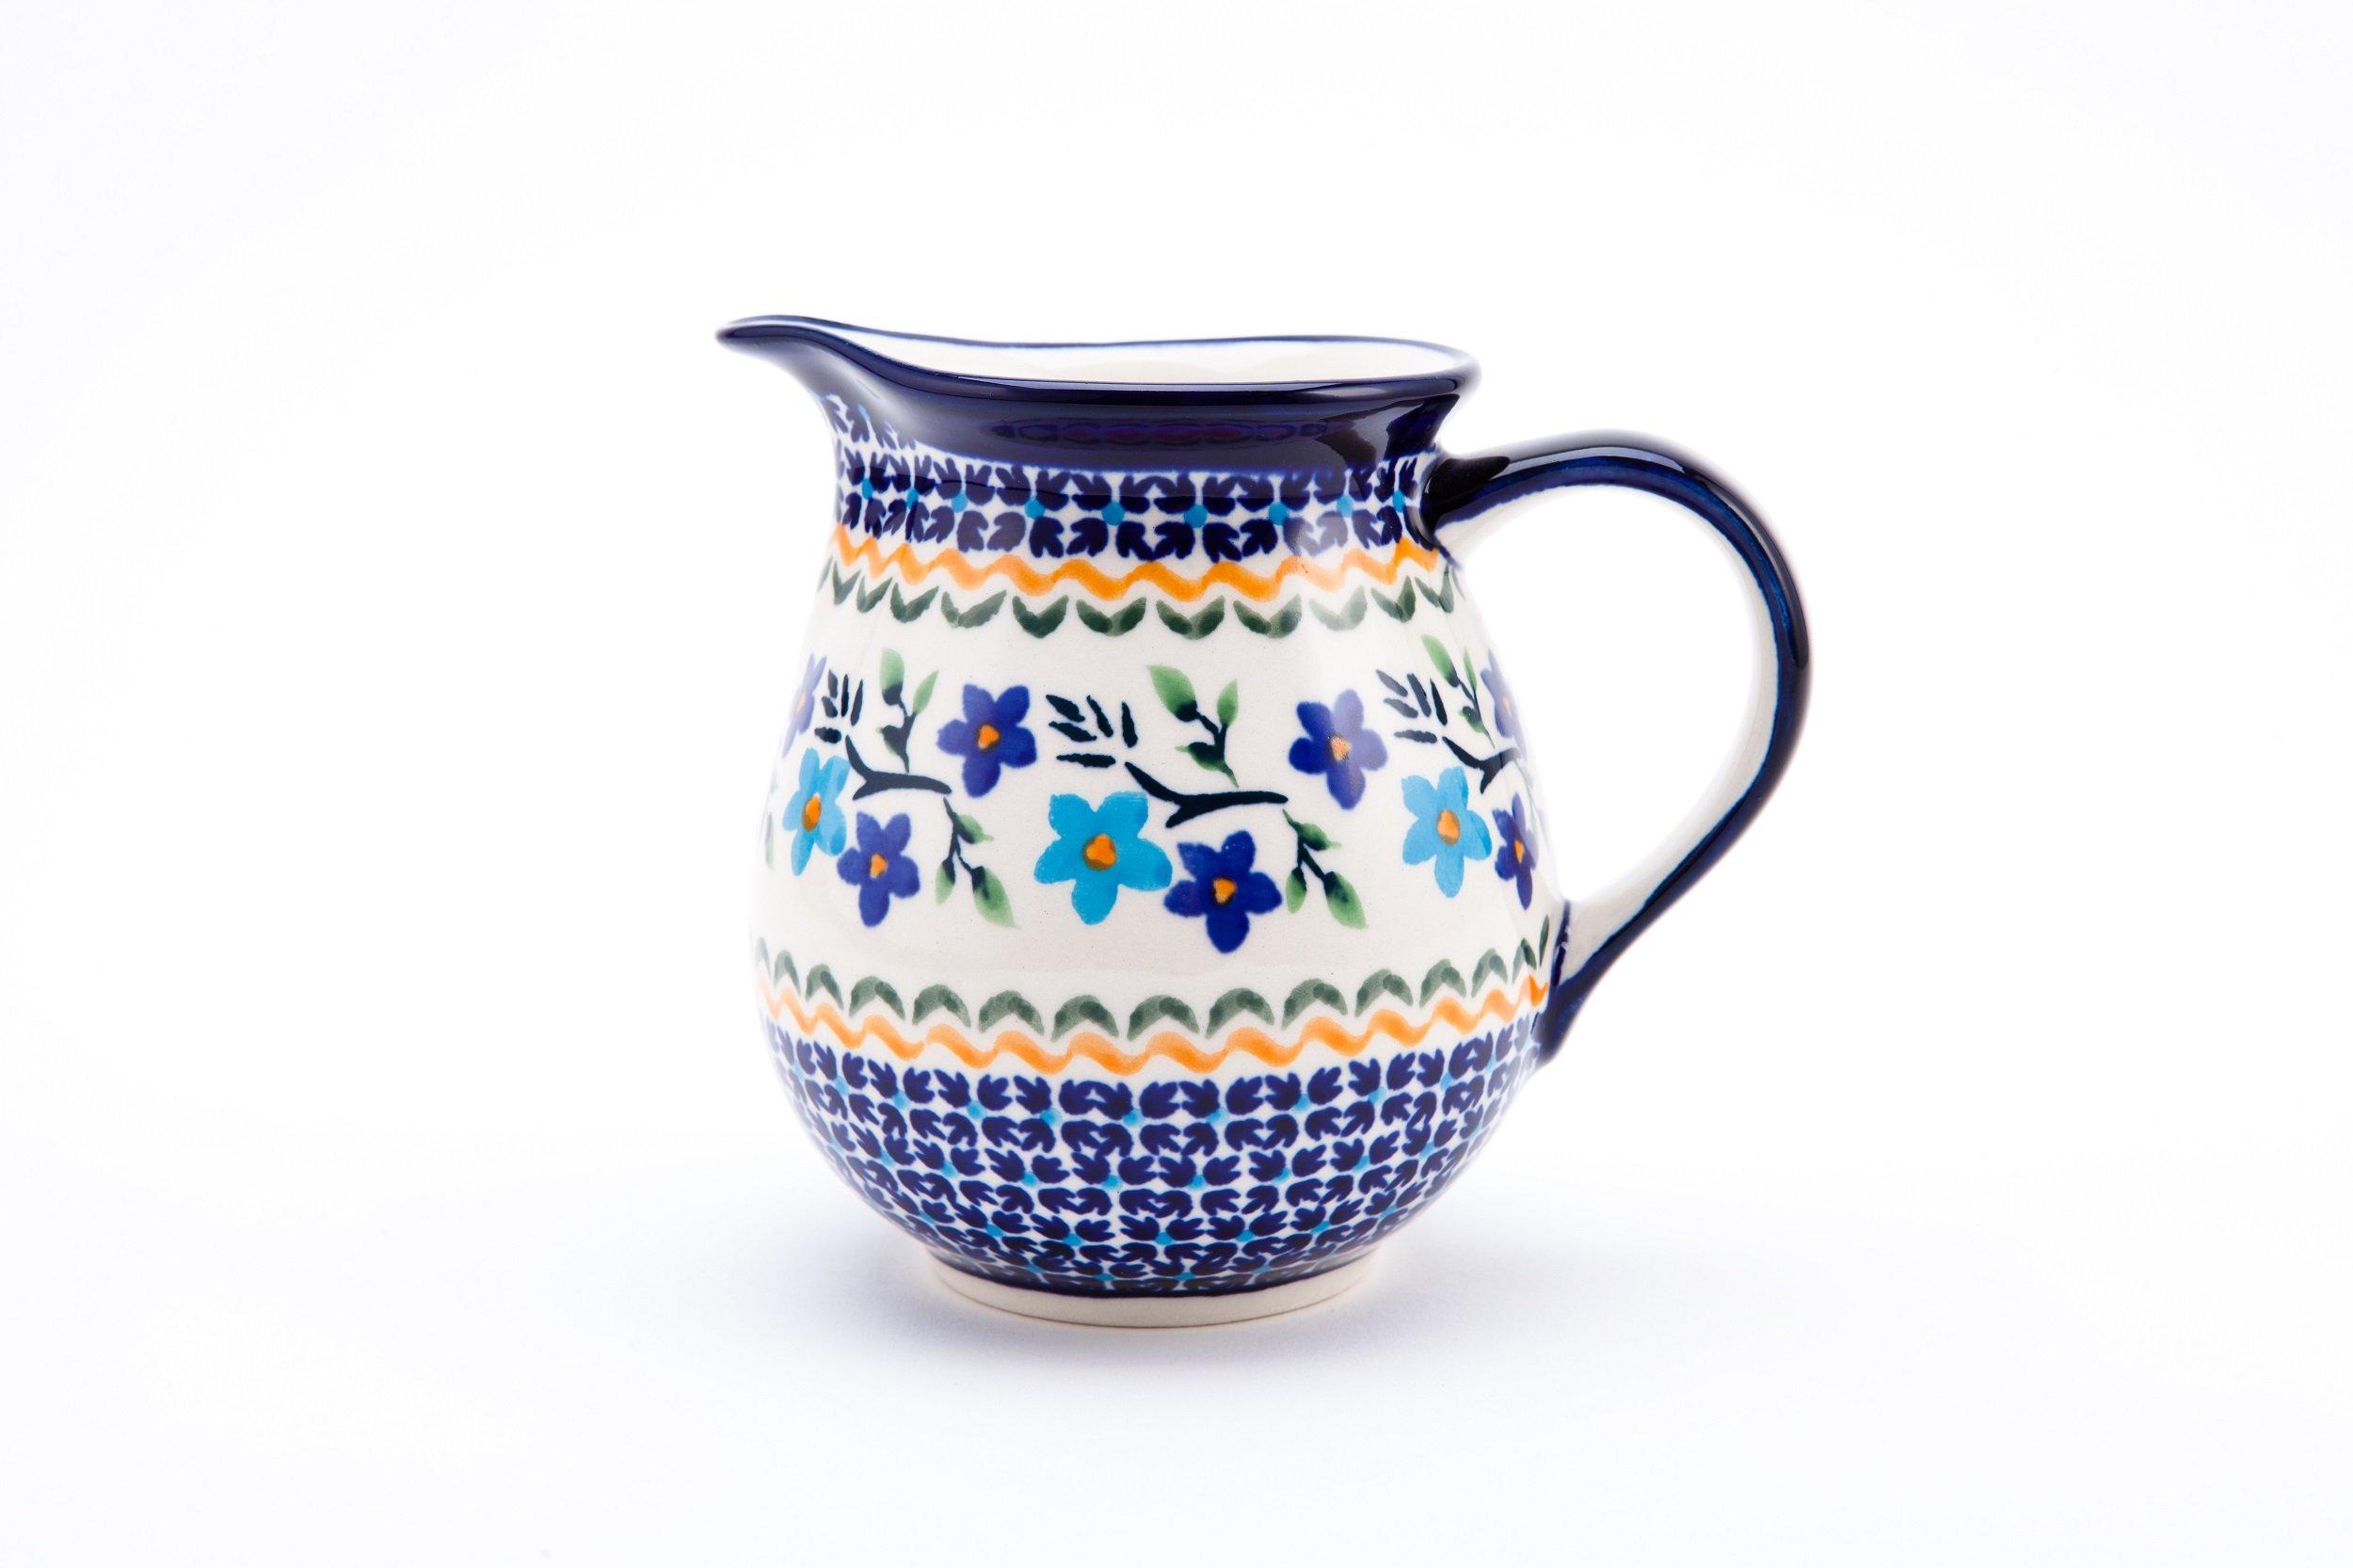 Hand-Decorated Polish Pottery Small Milk Jug/Creamer 0.42Litre ø13,1cm Height 11.8cm Decoration 1154A